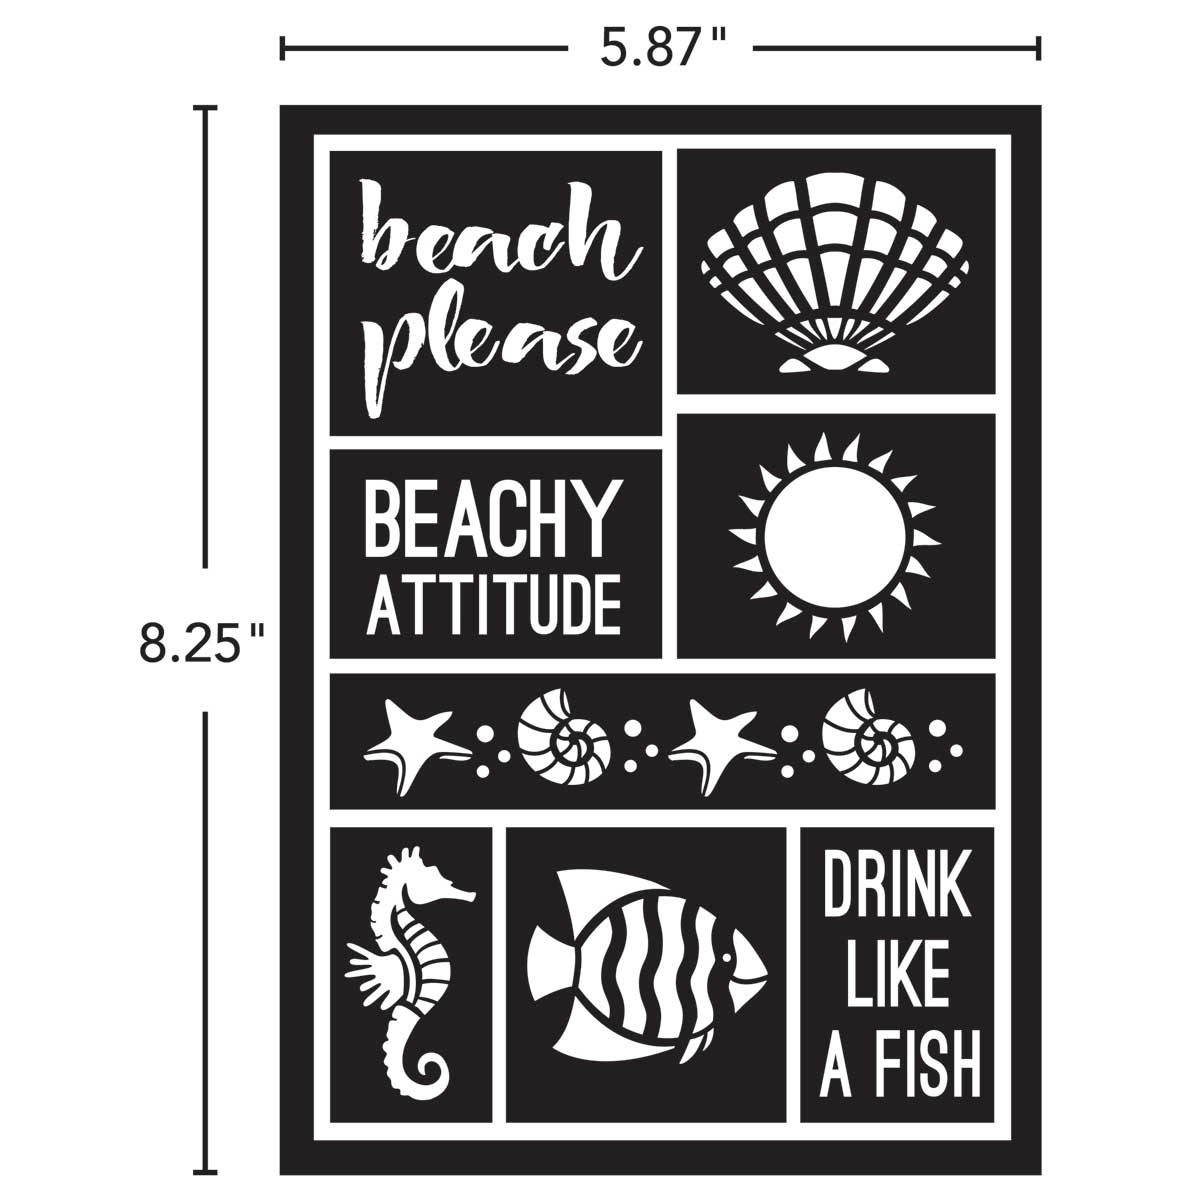 FolkArt ® Peel & Stick Painting Stencils - Beach Attitude - 71943